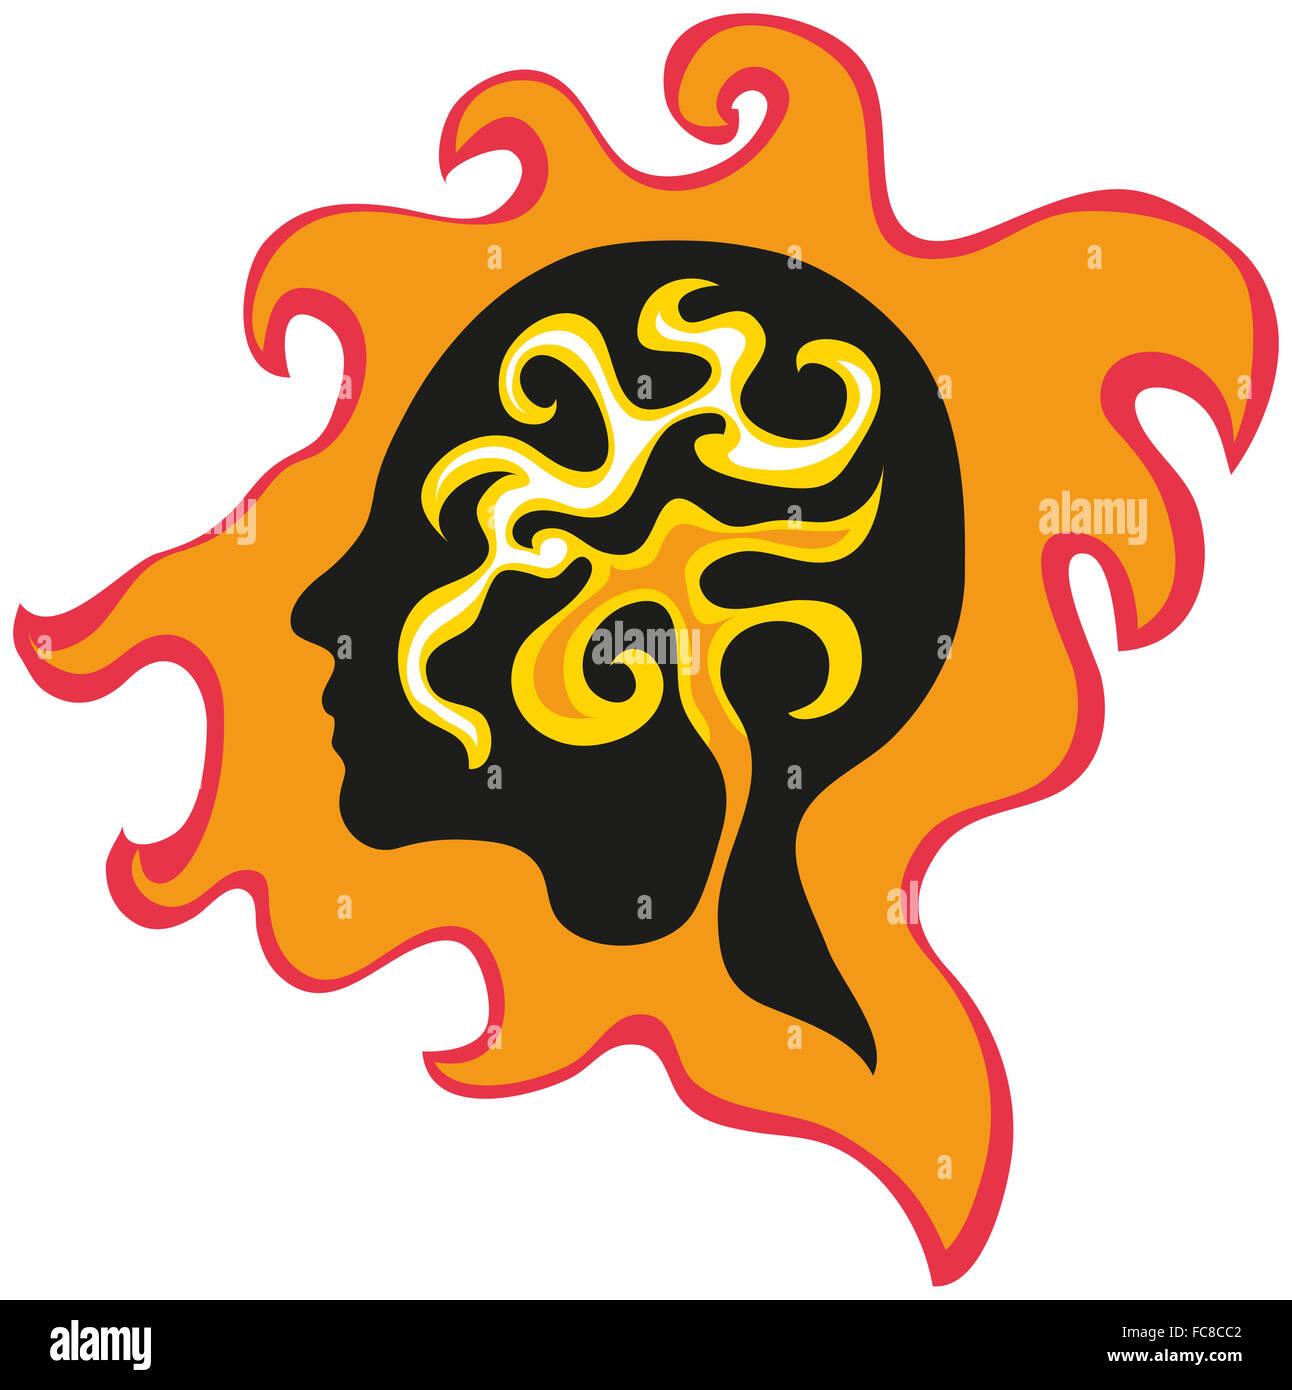 Graphic winding profile portrait, a silhouette in flames, retro style. Stock Photo